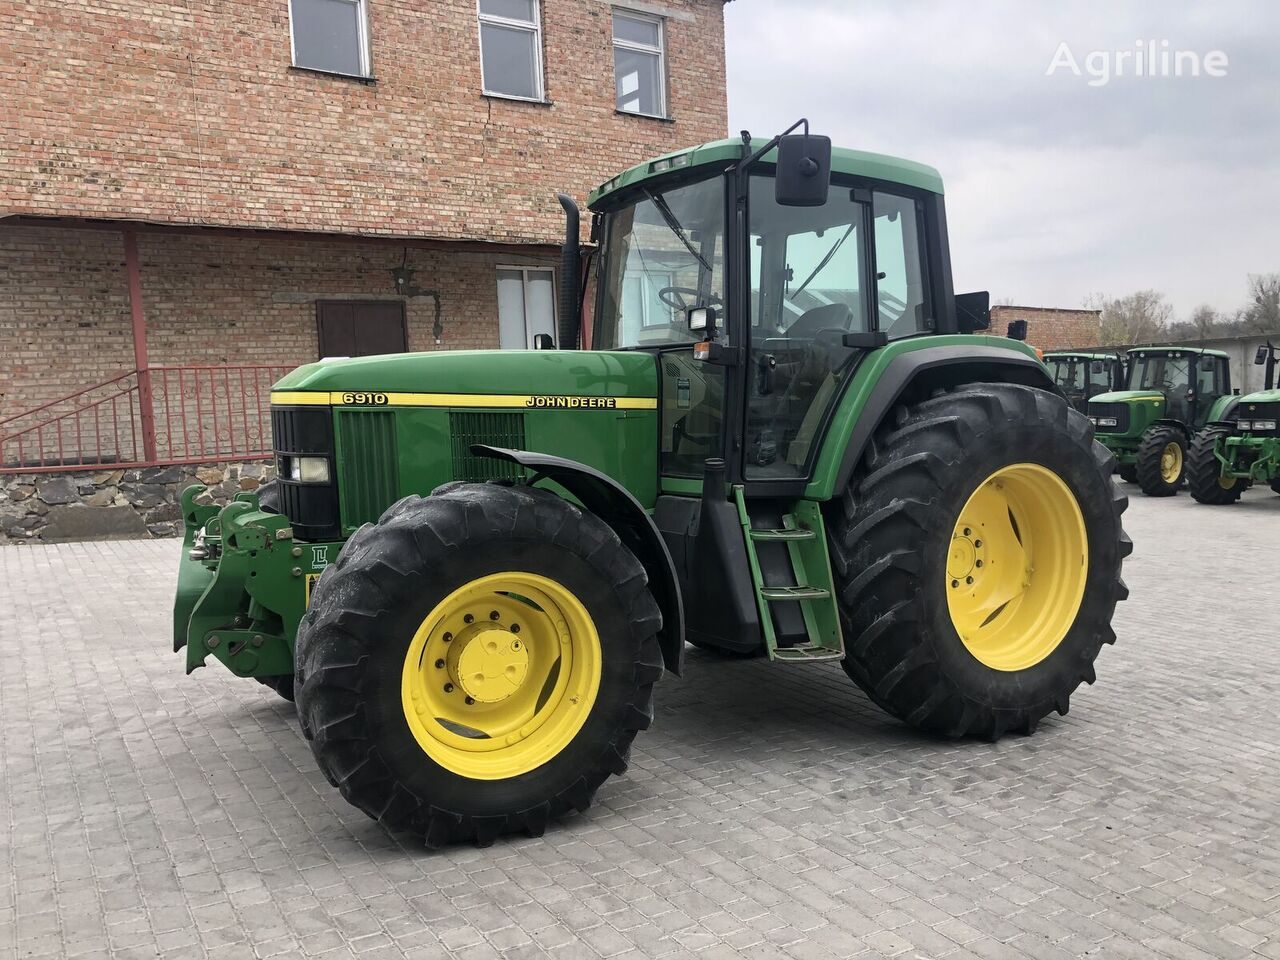 tracteur à roues JOHN DEERE 6910